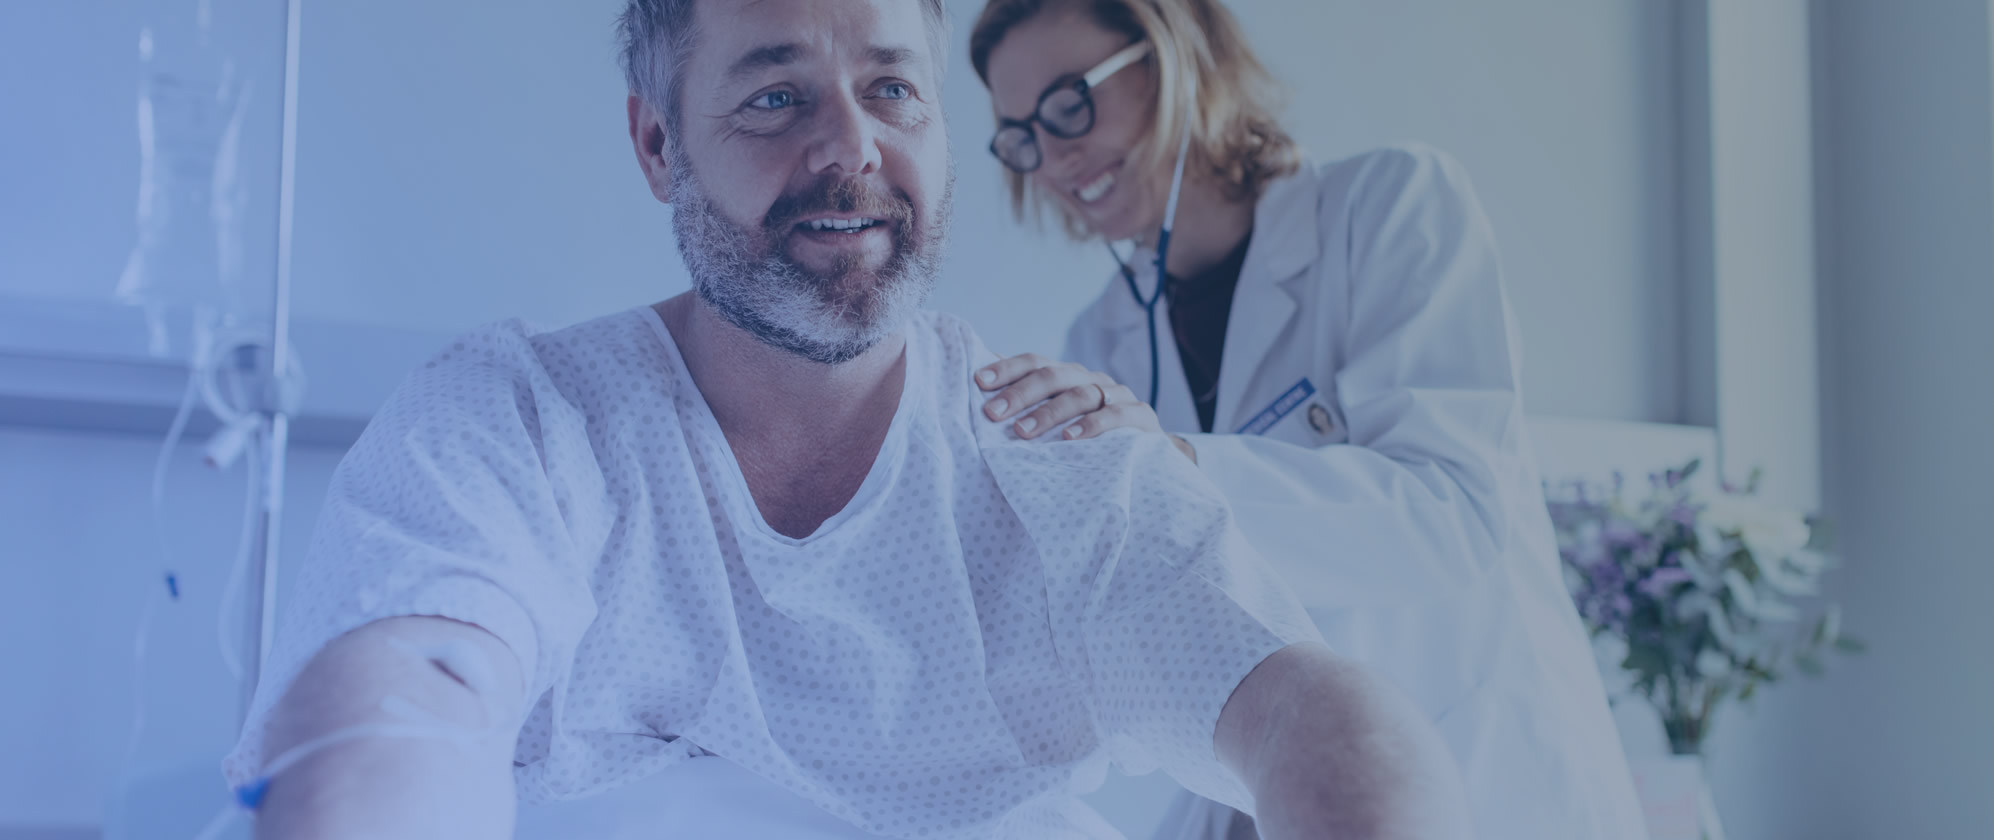 health insurance truwealth